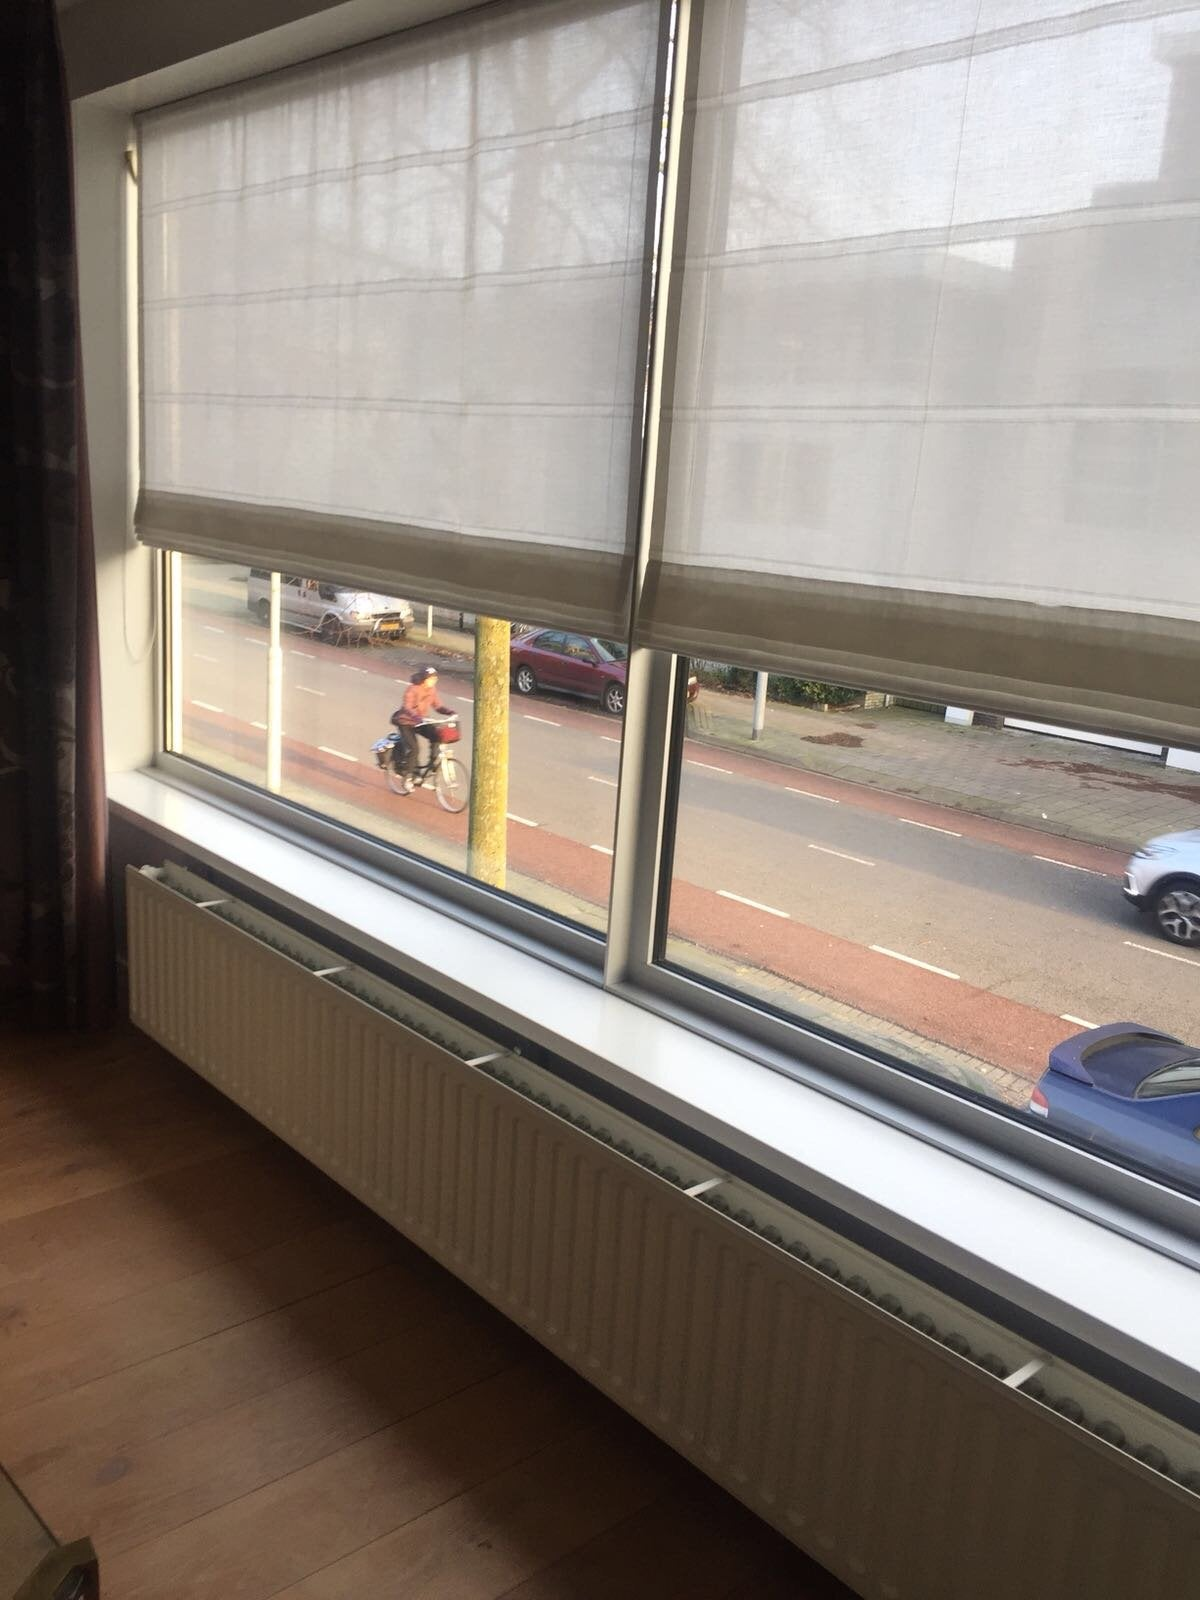 https://public.parariusoffice.nl/298/photos/huge/51563729.1518087862-778.JPG